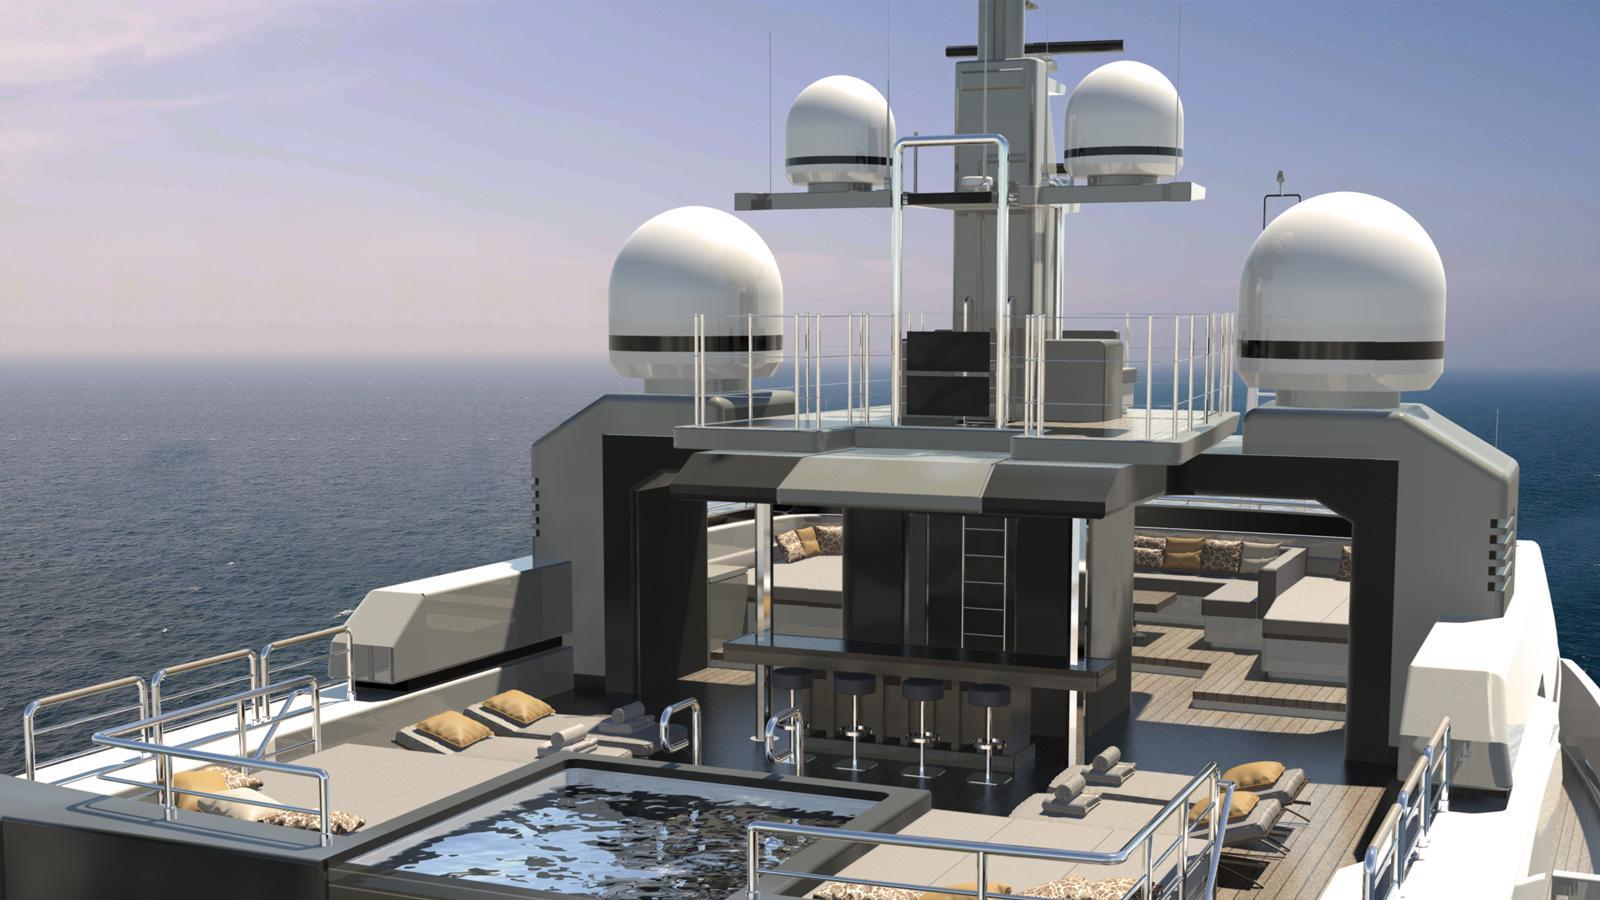 MAVERICK 55 - Spa pool, bar and telescopic lounge